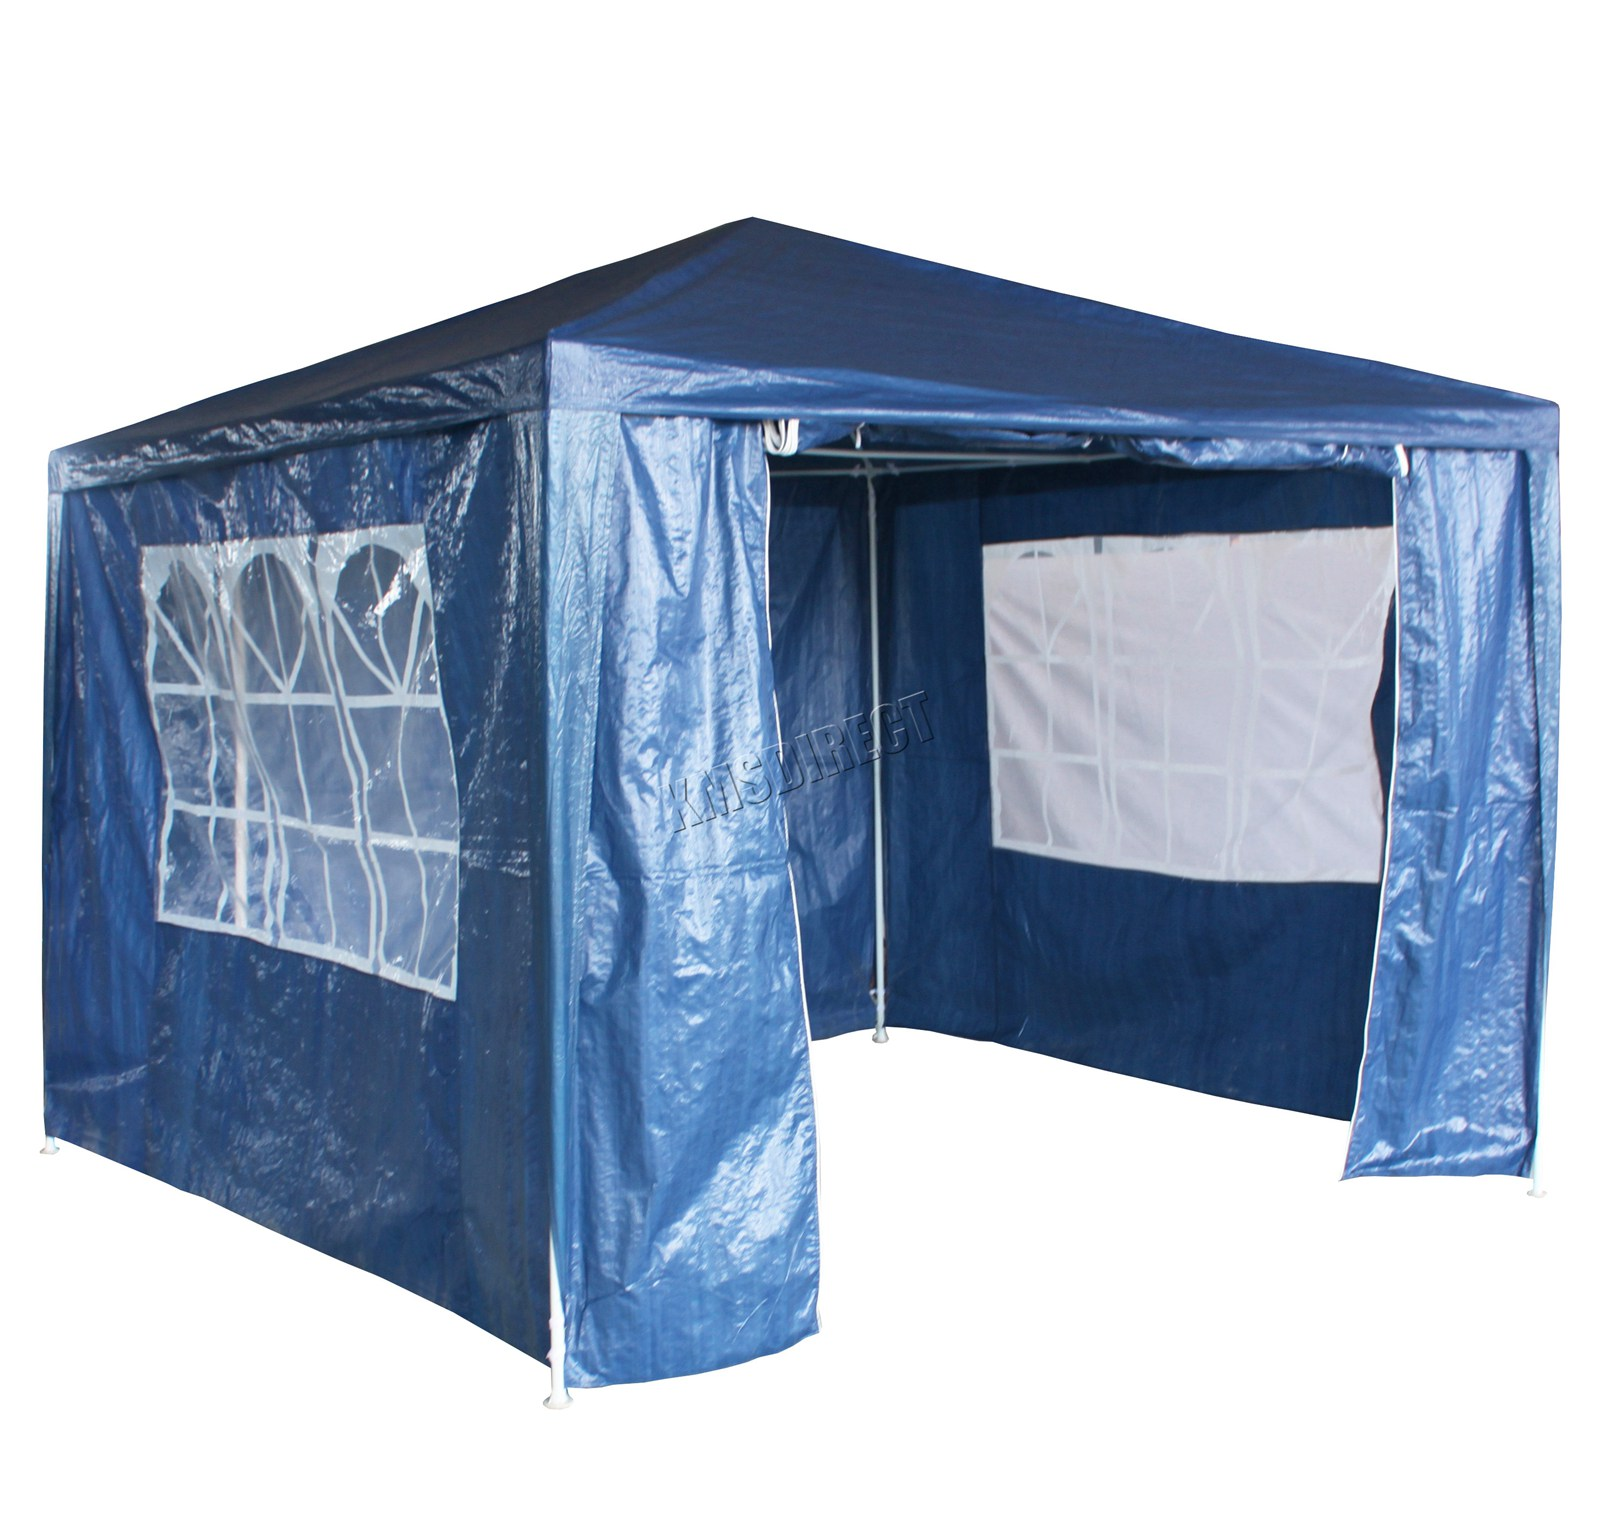 New-3-x-3m-120g-Waterproof-Outdoor-PE-Garden-Gazebo-Marquee-Canopy-Party-Tent Indexbild 16